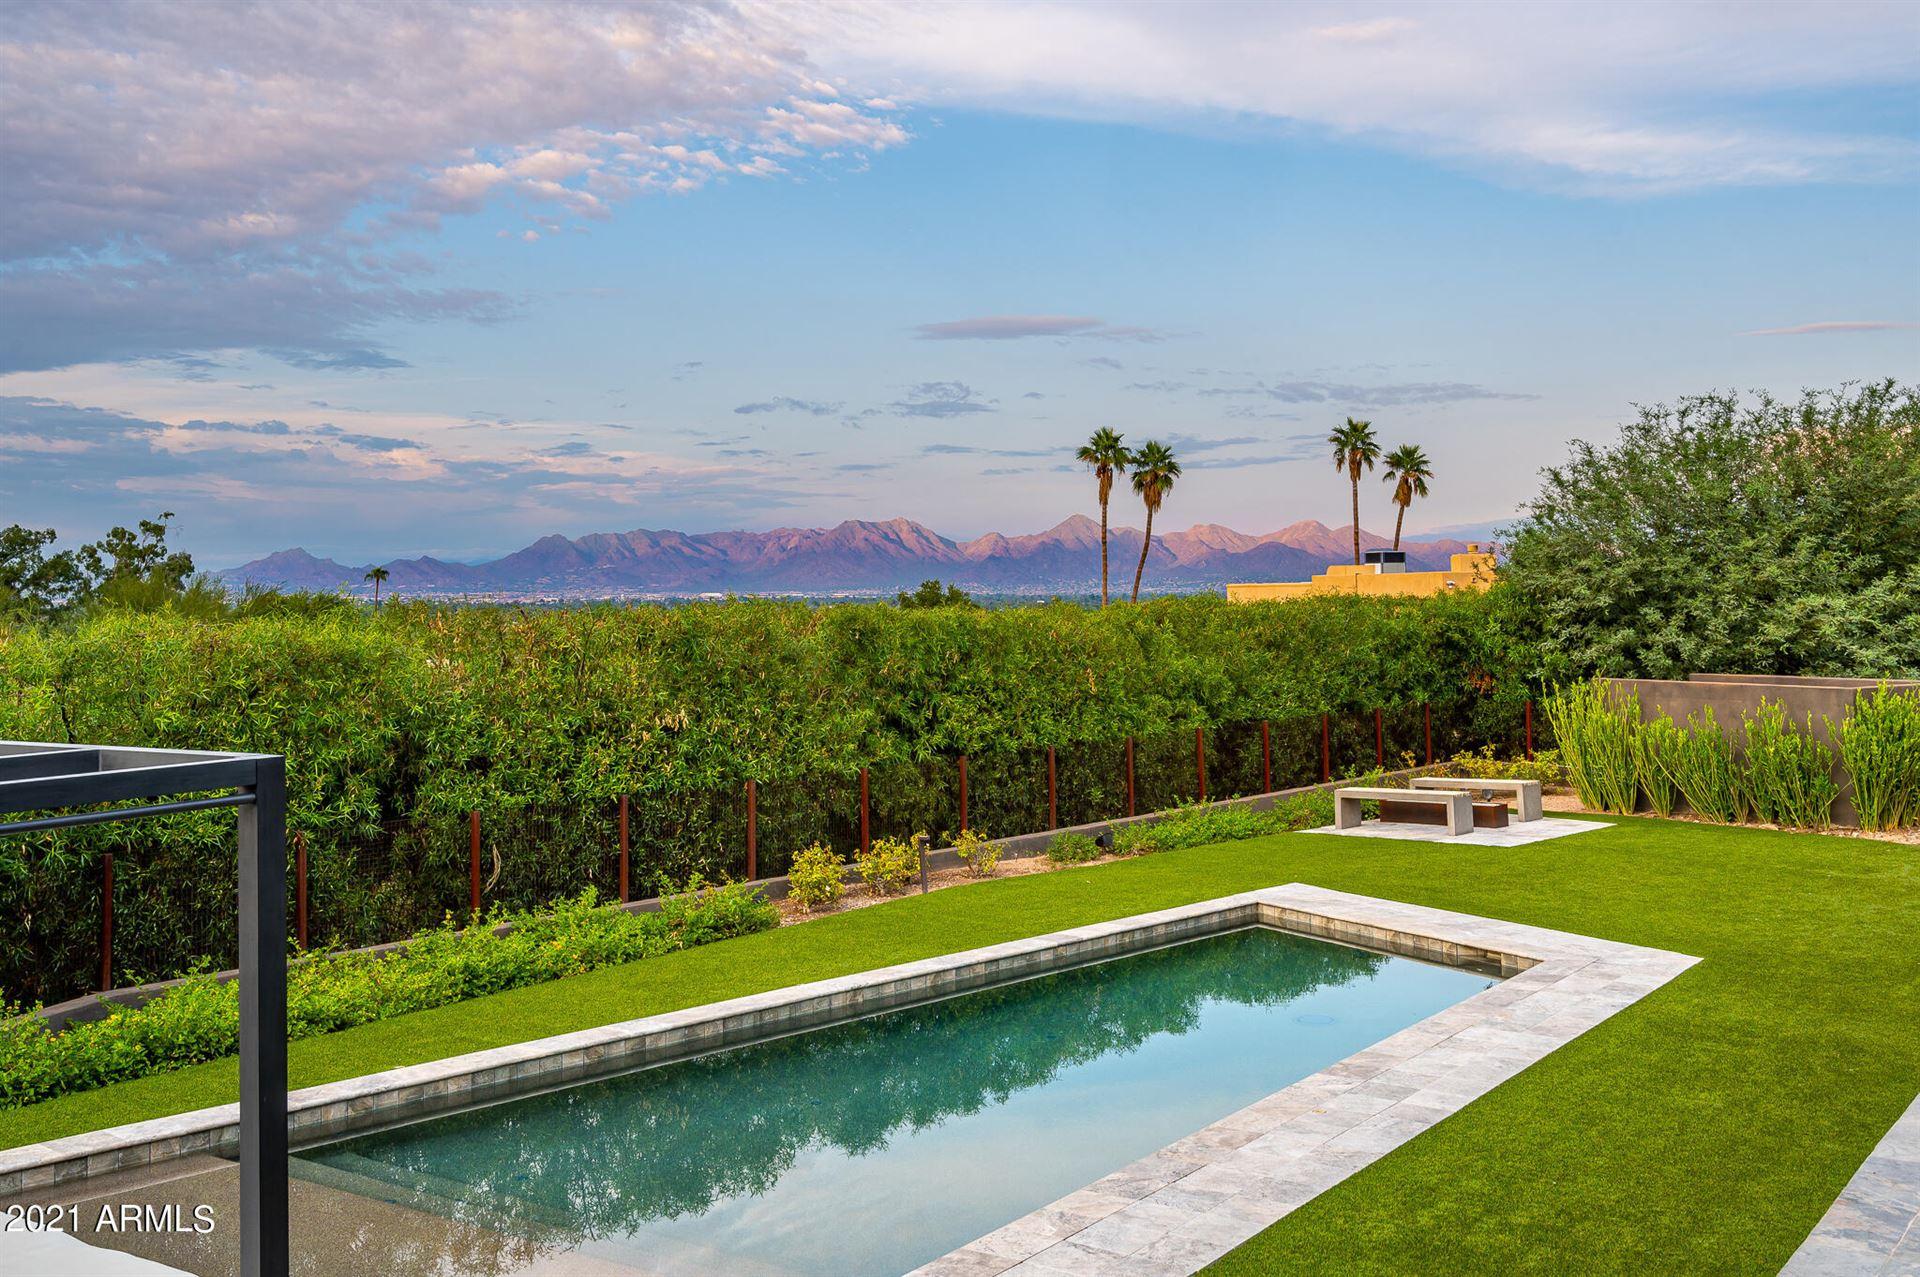 Photo of 4700 E CHARLES Drive, Paradise Valley, AZ 85253 (MLS # 6305716)